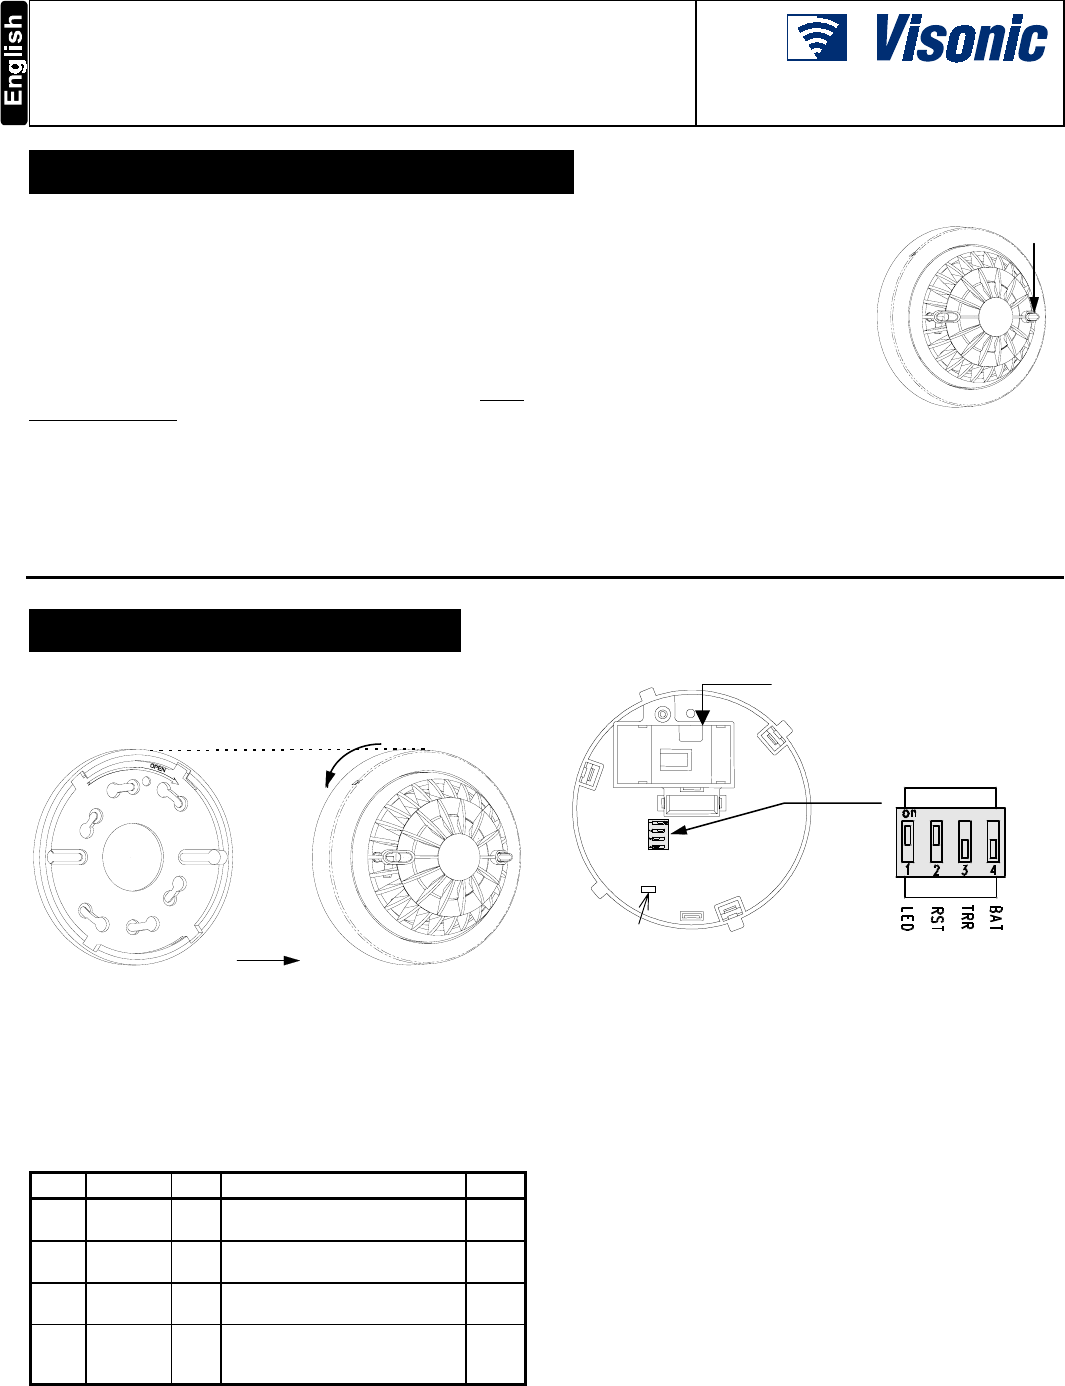 Visonic MCT425 Photoelectric Smoke Detector User Manual DE3642 0